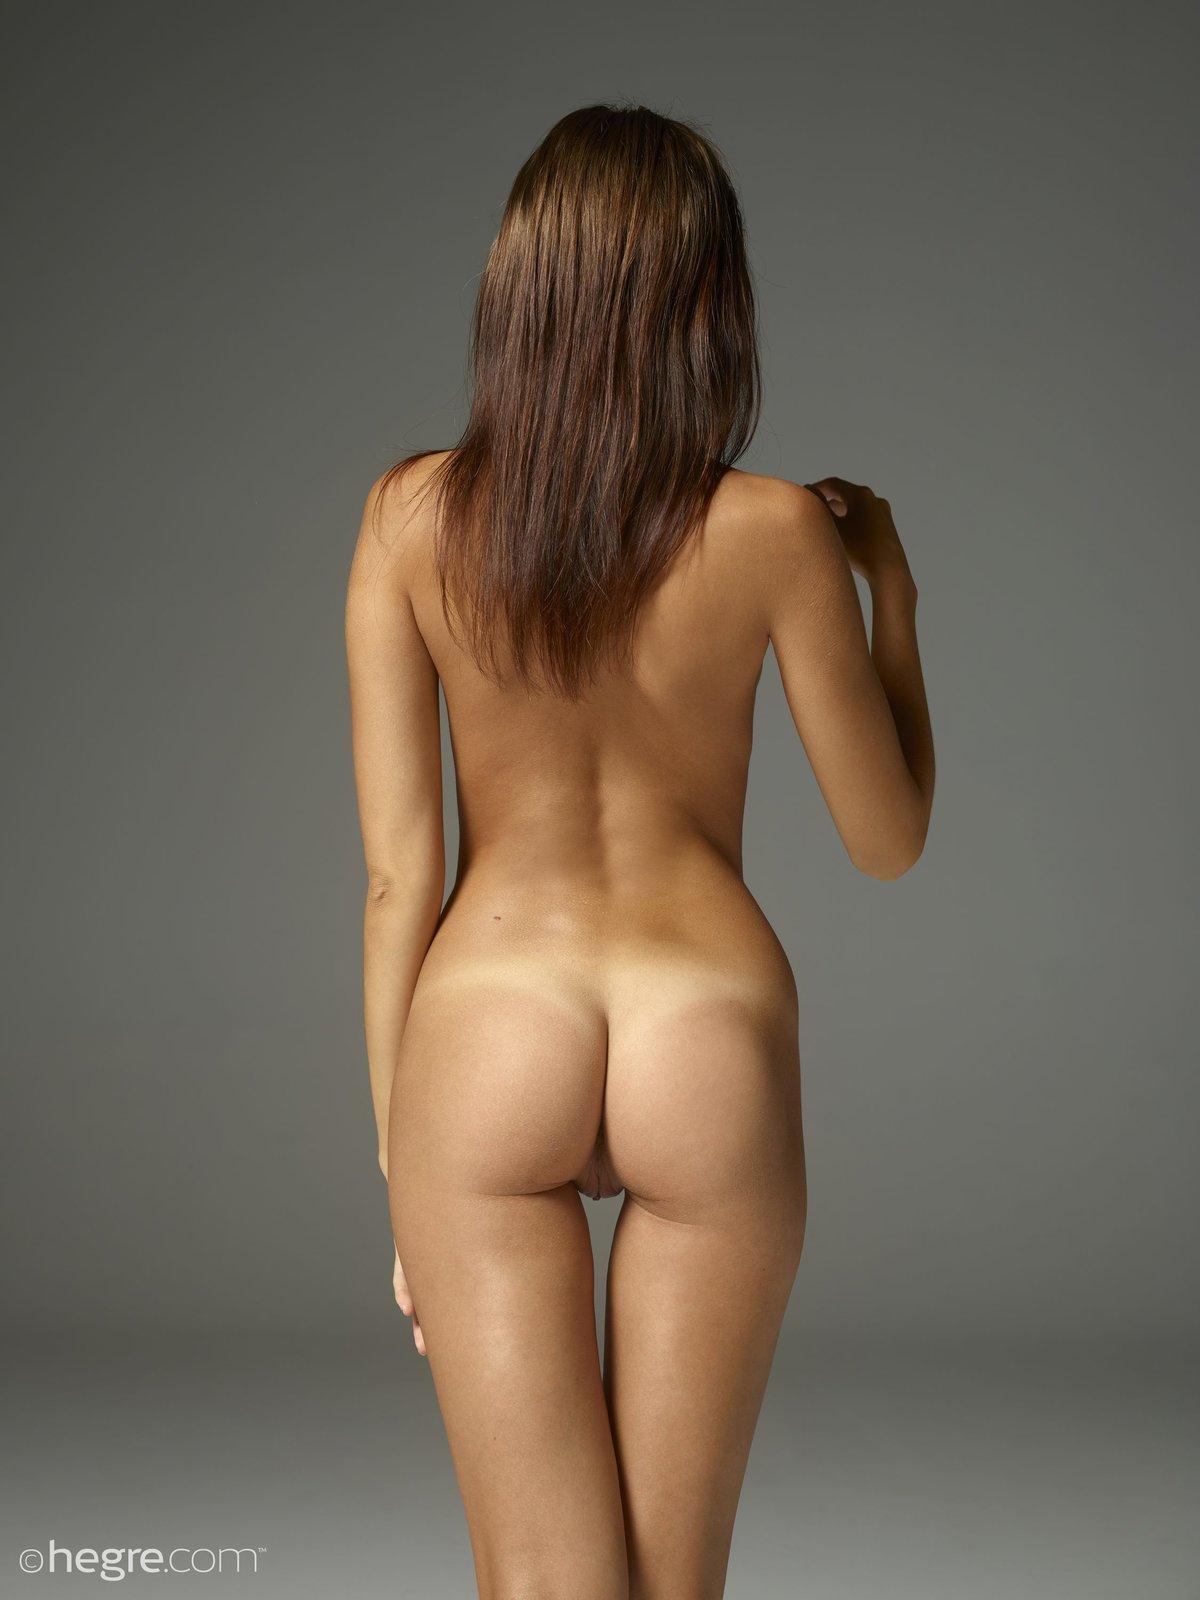 Nude Photo HQ Chubby carrier cd